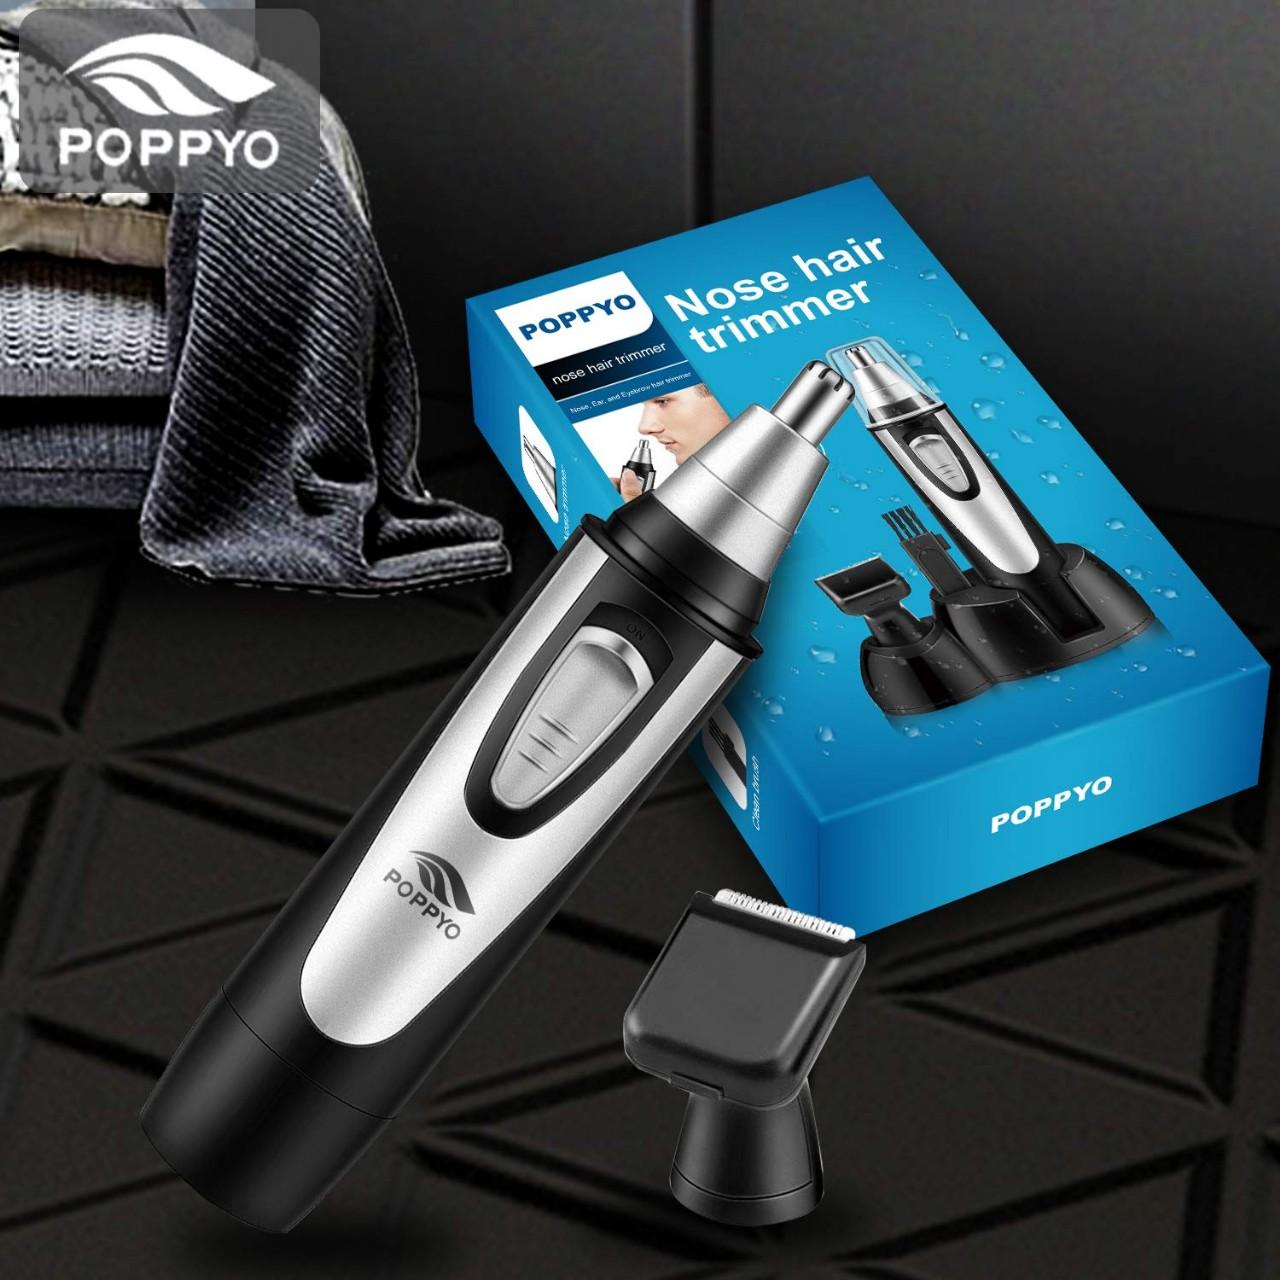 Nose Hair Trimmer for Men Women, POPPYO 2019 Professional Nose, Ear Hair Trimmer Clipper, Waterproof